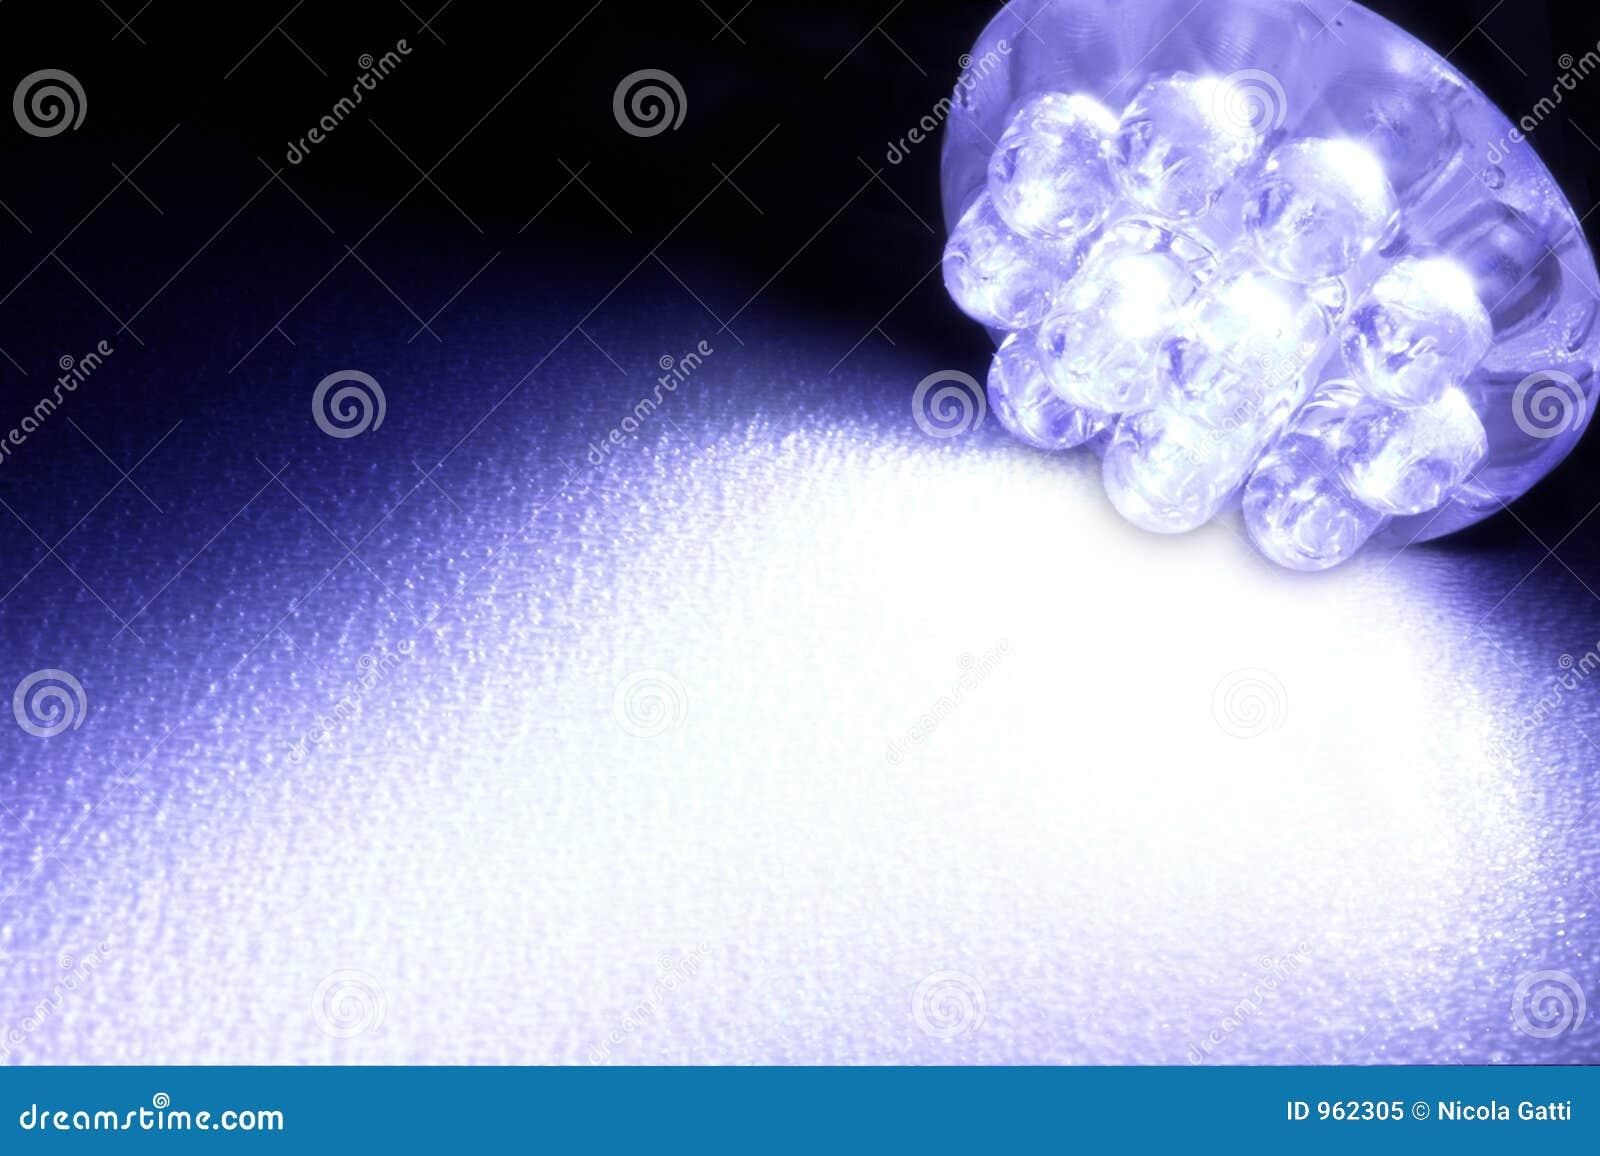 LED light emitting diode